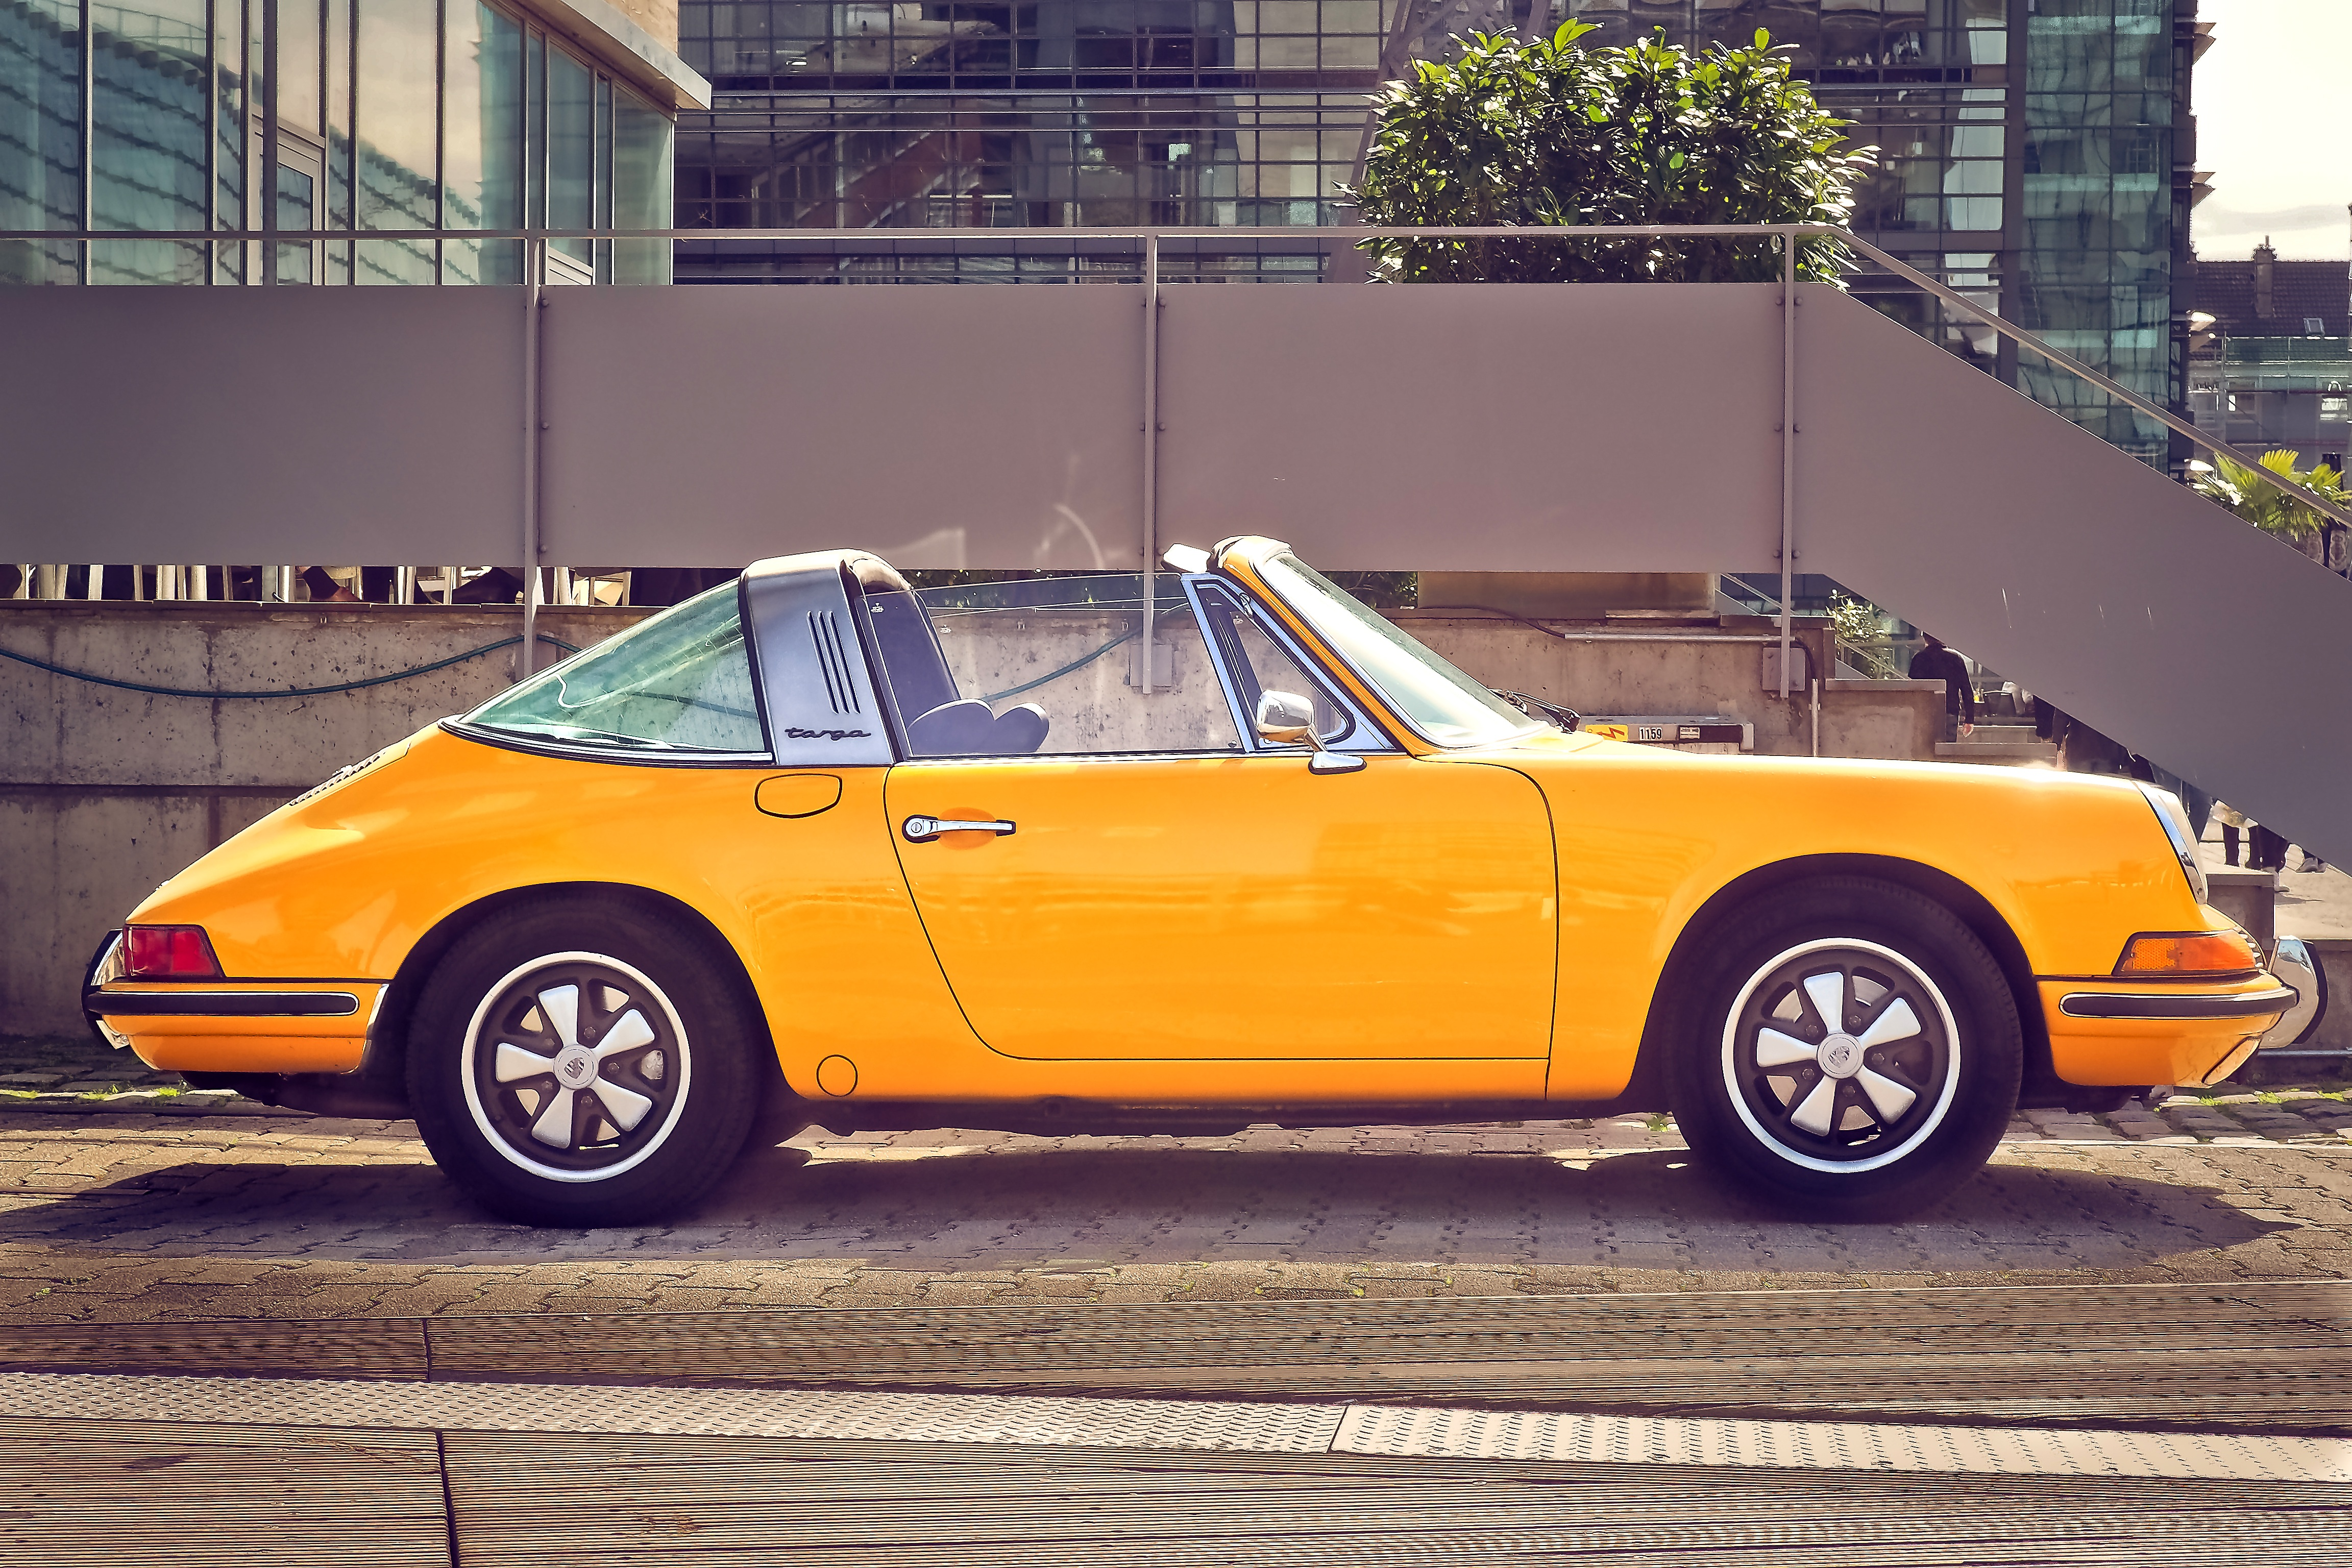 Yellow Convertible Car